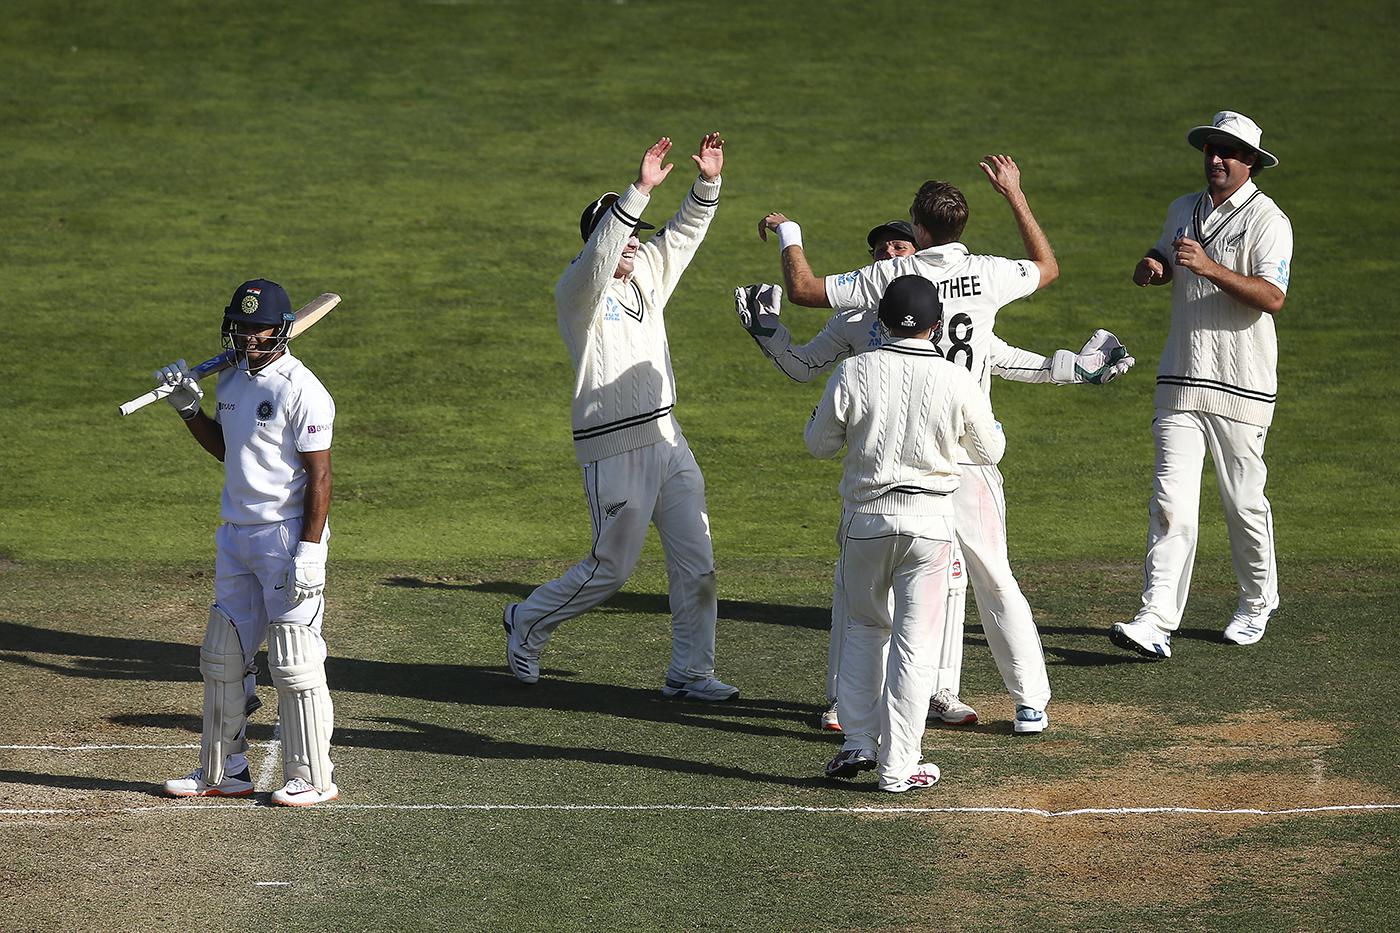 Full Scorecard of India vs New Zealand 1st Test 2019/20 - Score Report | ESPNcricinfo.com